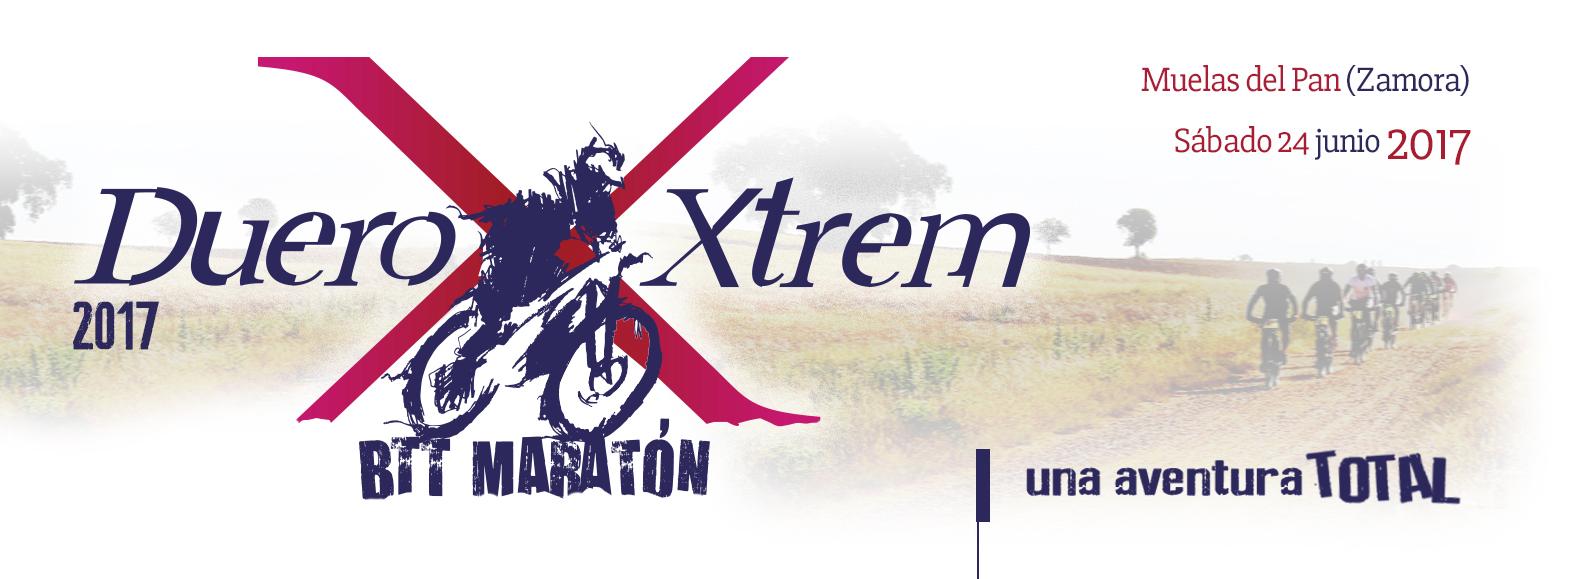 Duero Xtrem Maraton